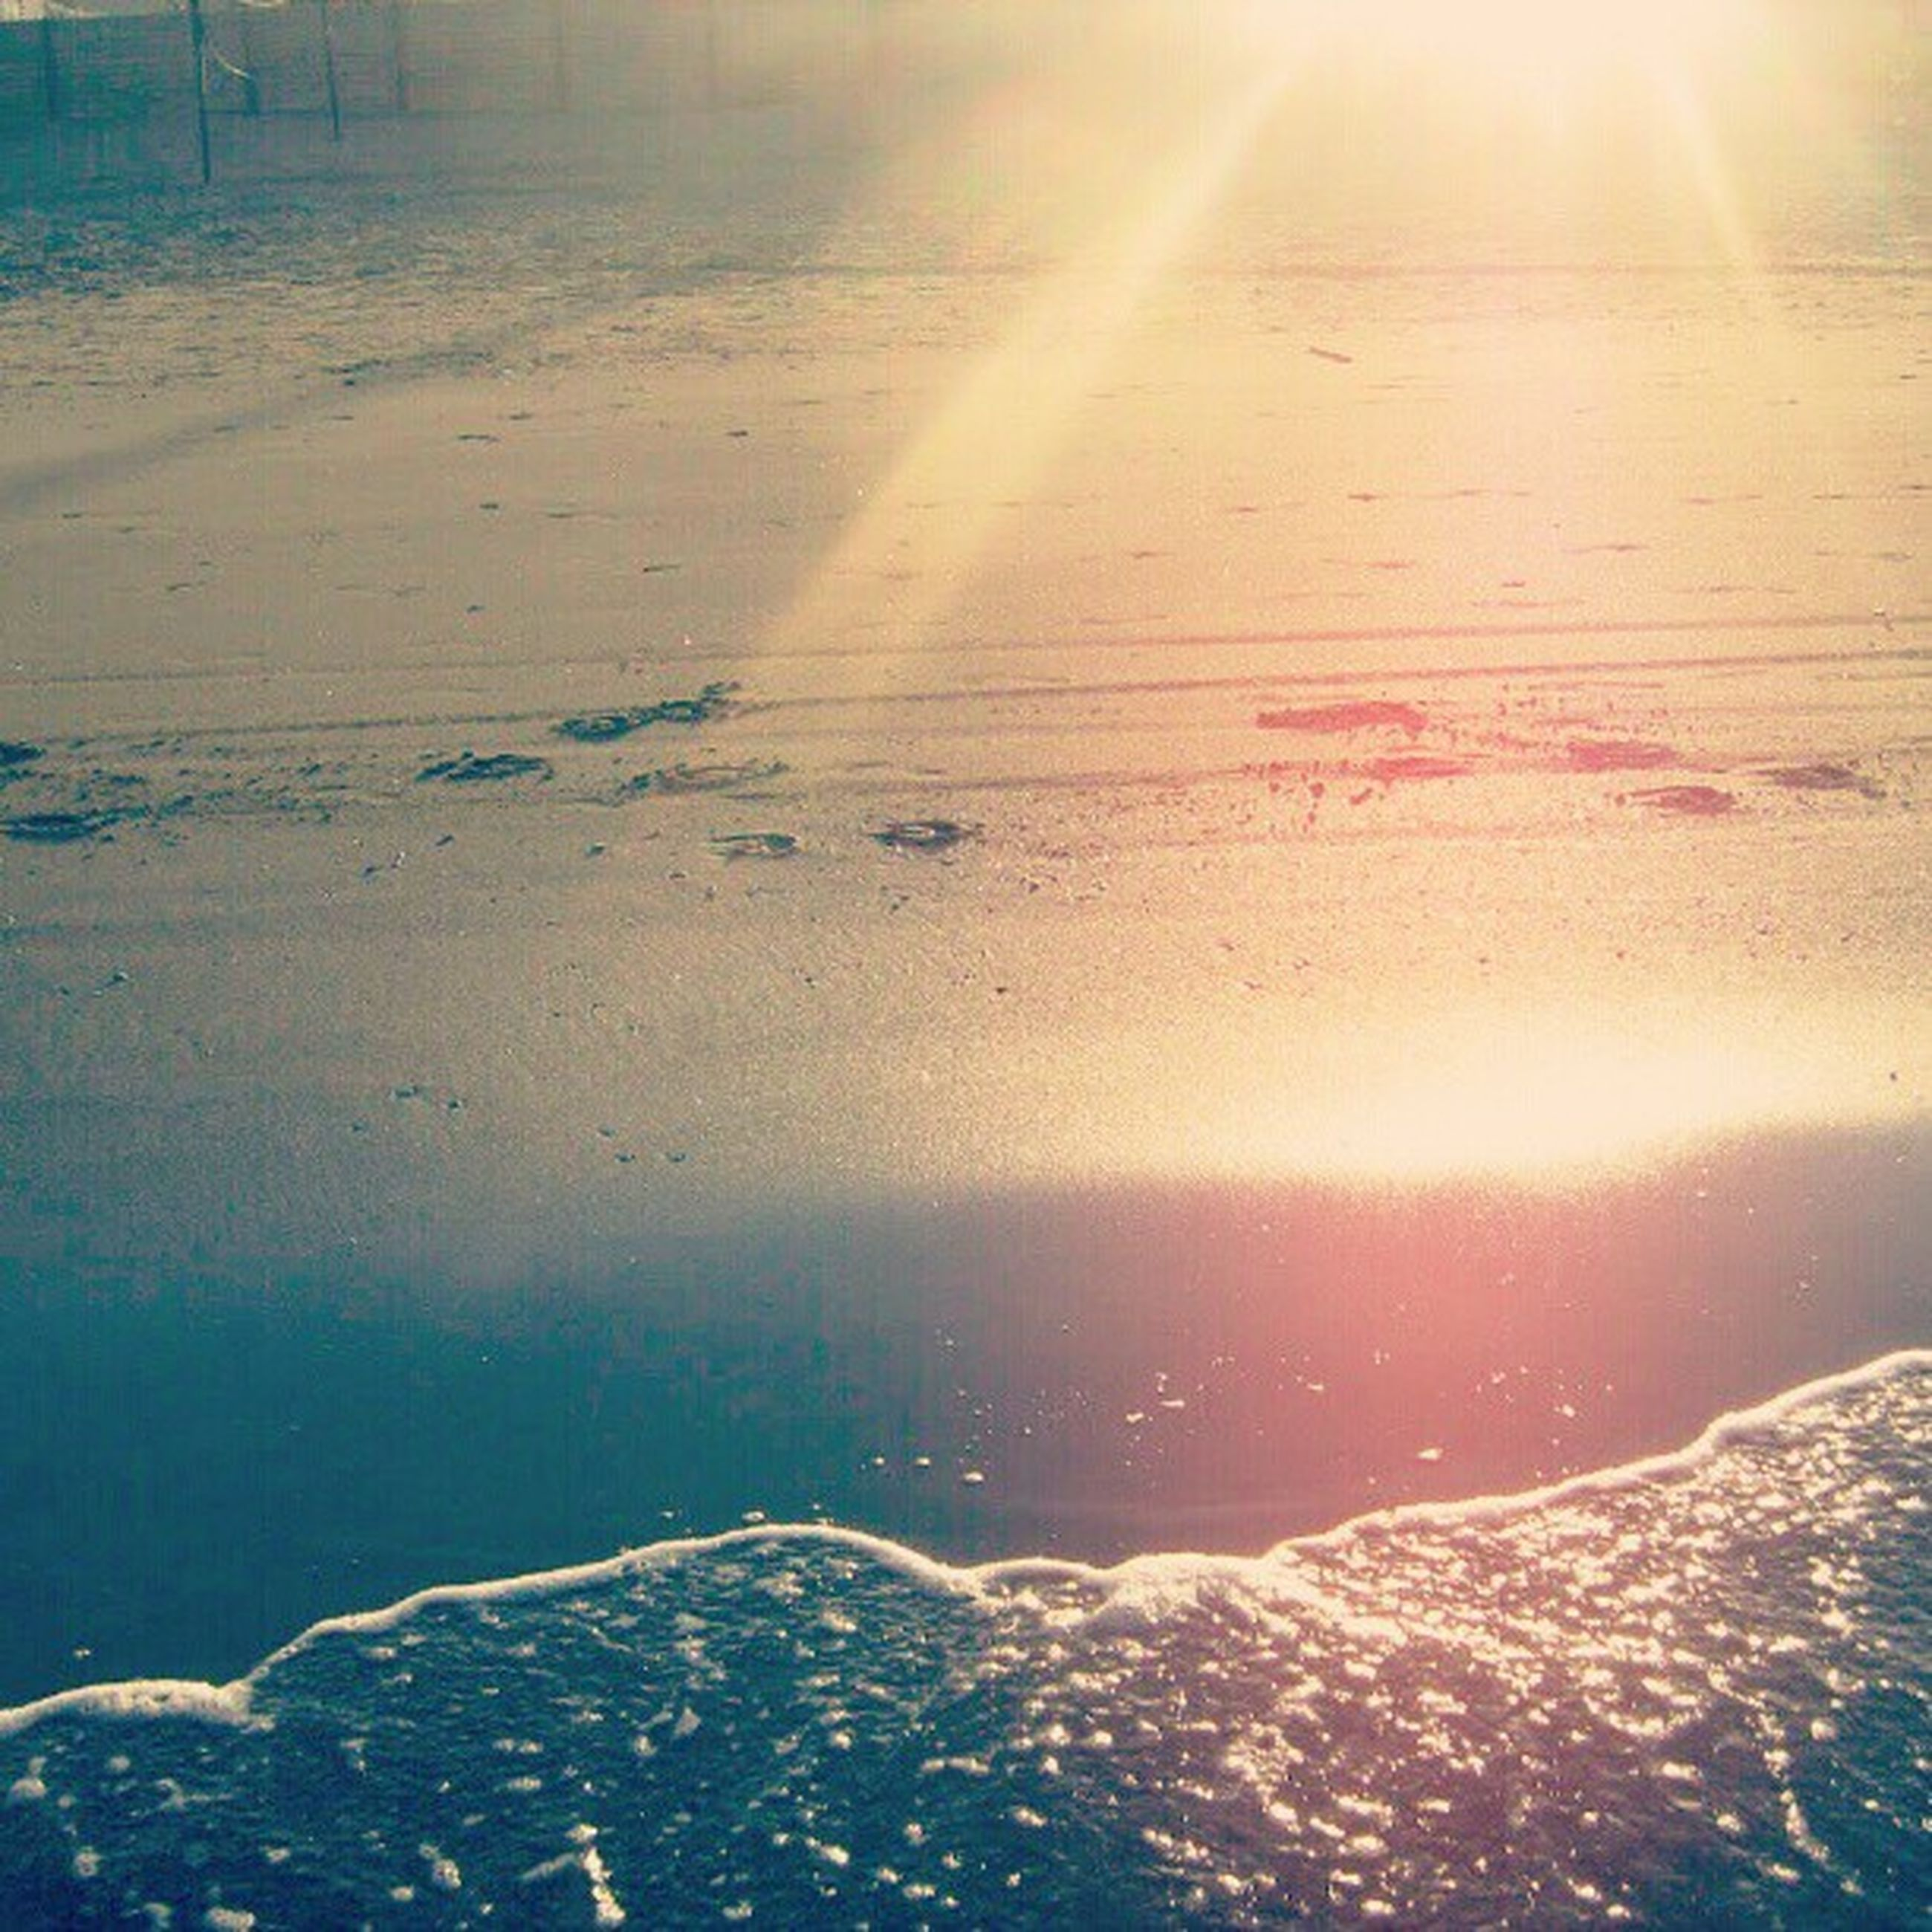 scenics, tranquility, water, tranquil scene, beauty in nature, sea, sun, nature, beach, sunlight, sunbeam, idyllic, sand, shore, lens flare, aerial view, non-urban scene, sky, landscape, outdoors